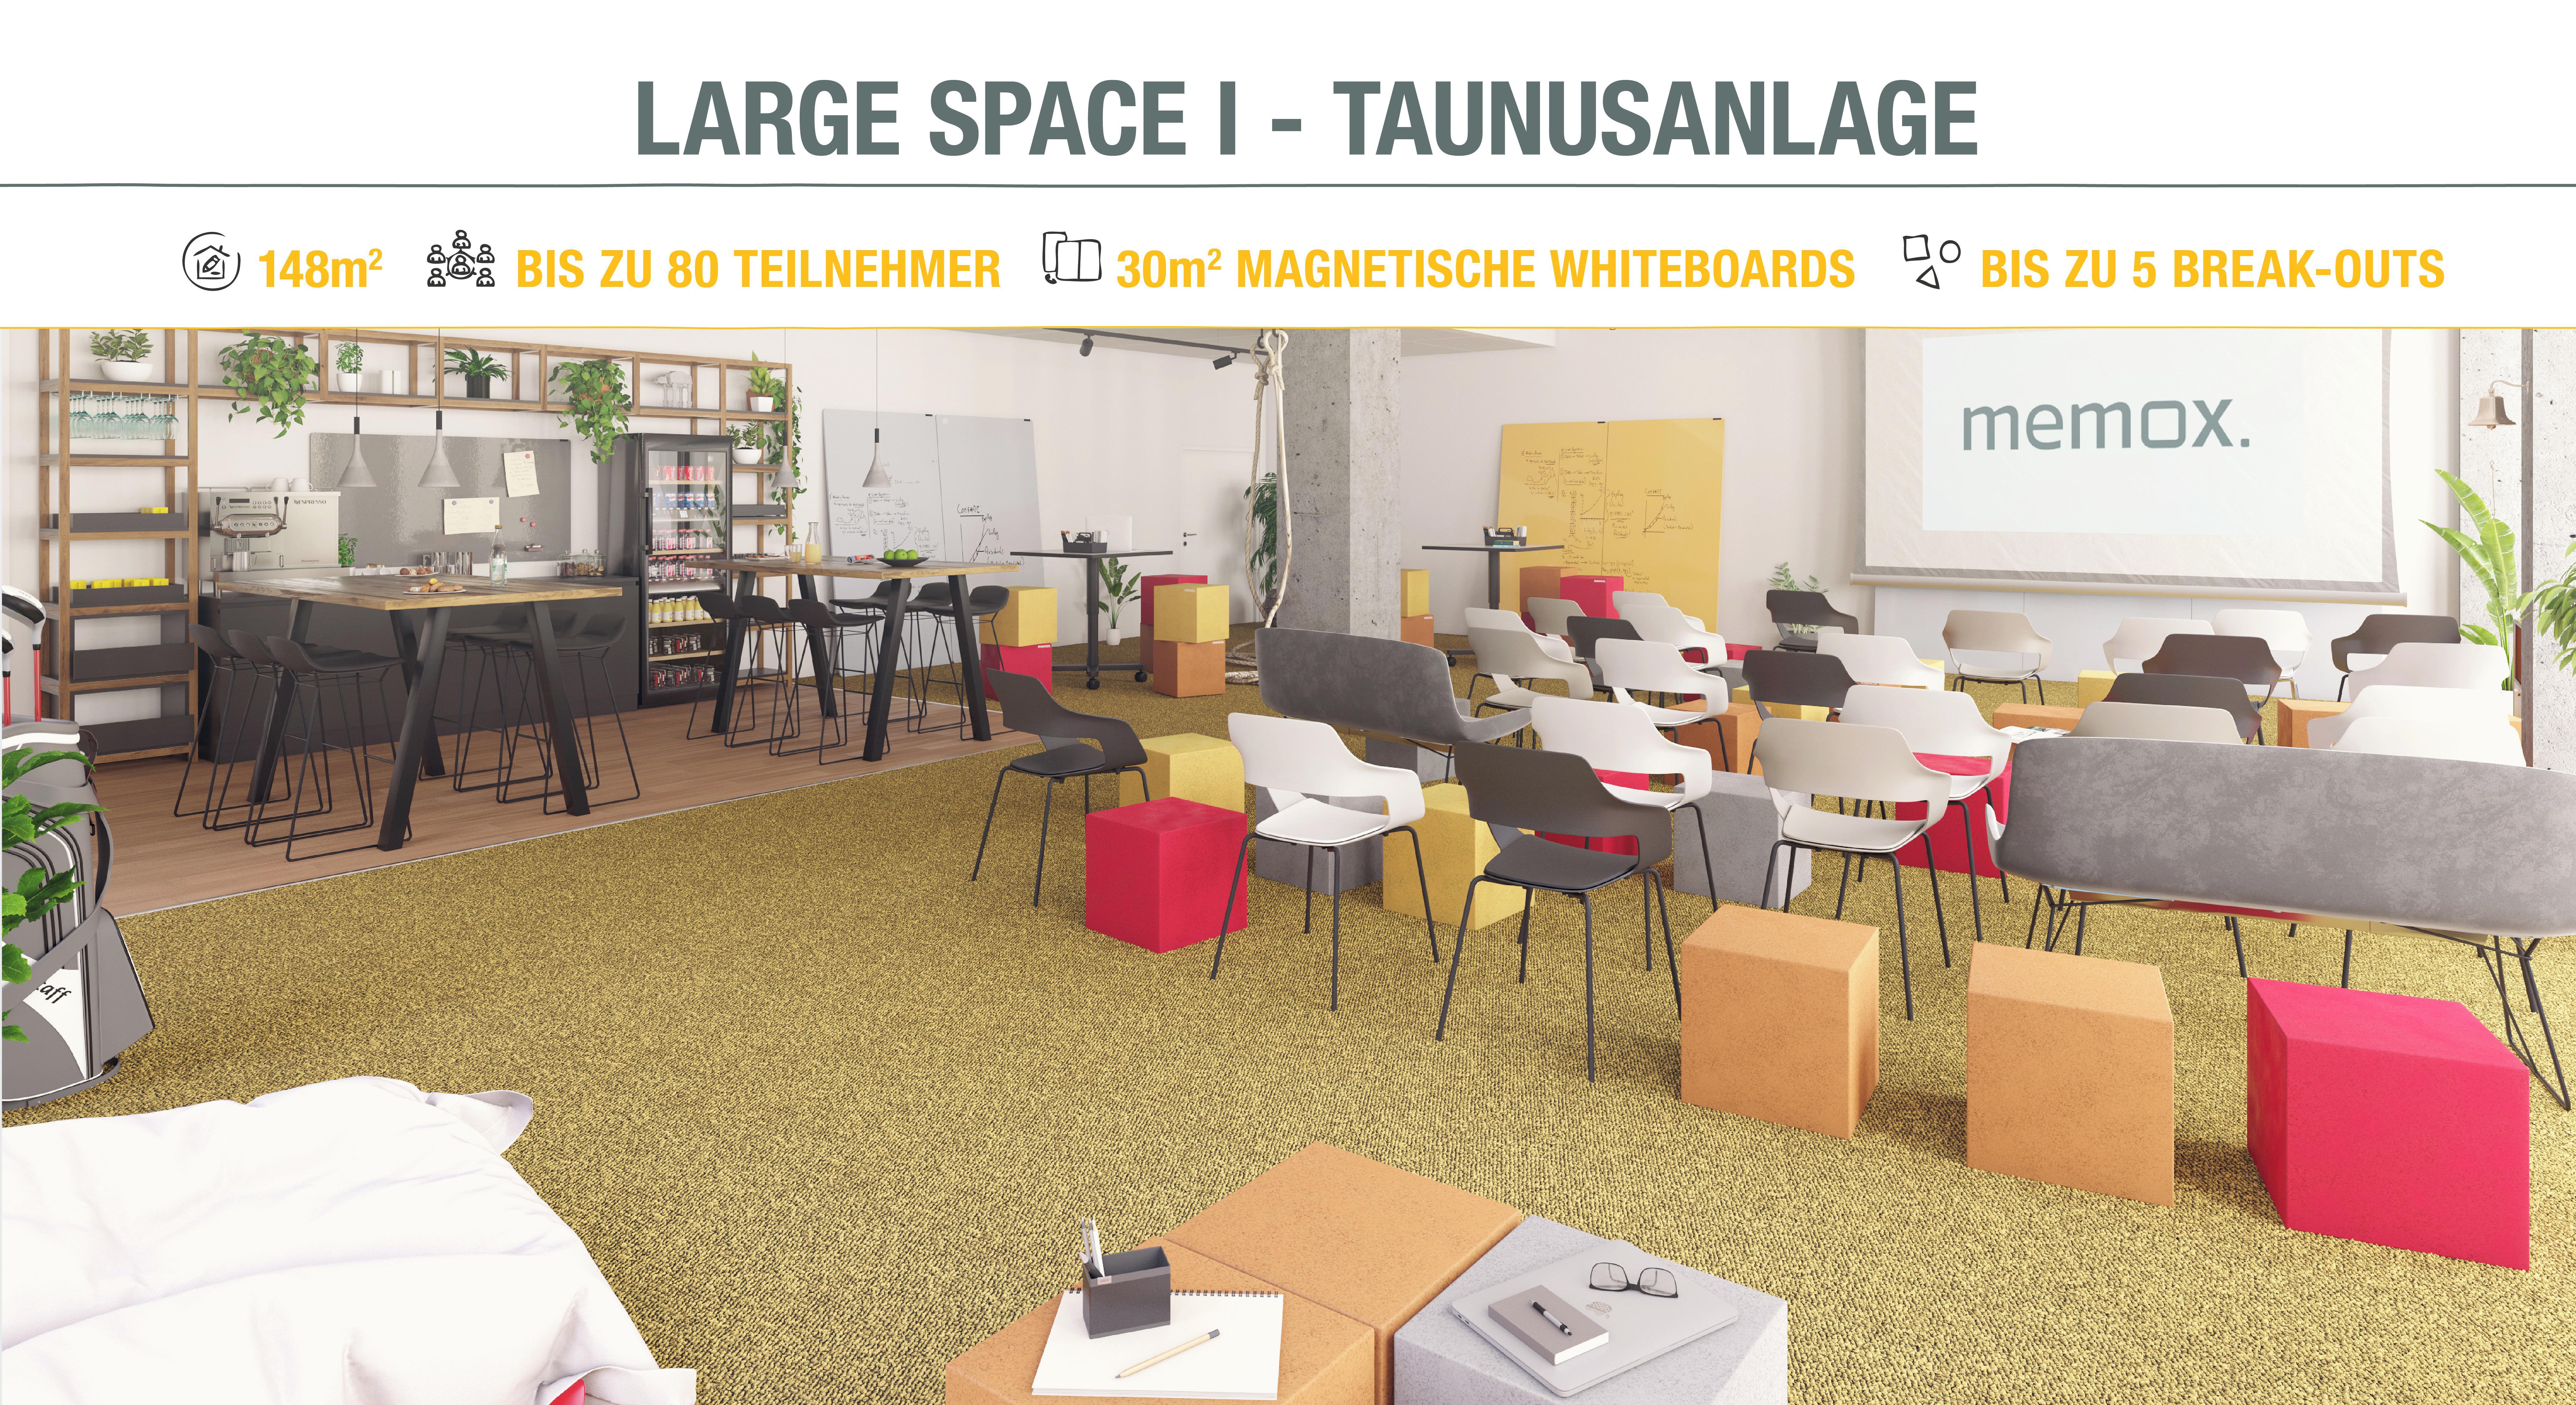 Frankfurt Schulungsräume Meeting room memox. Large Space #1 image 0